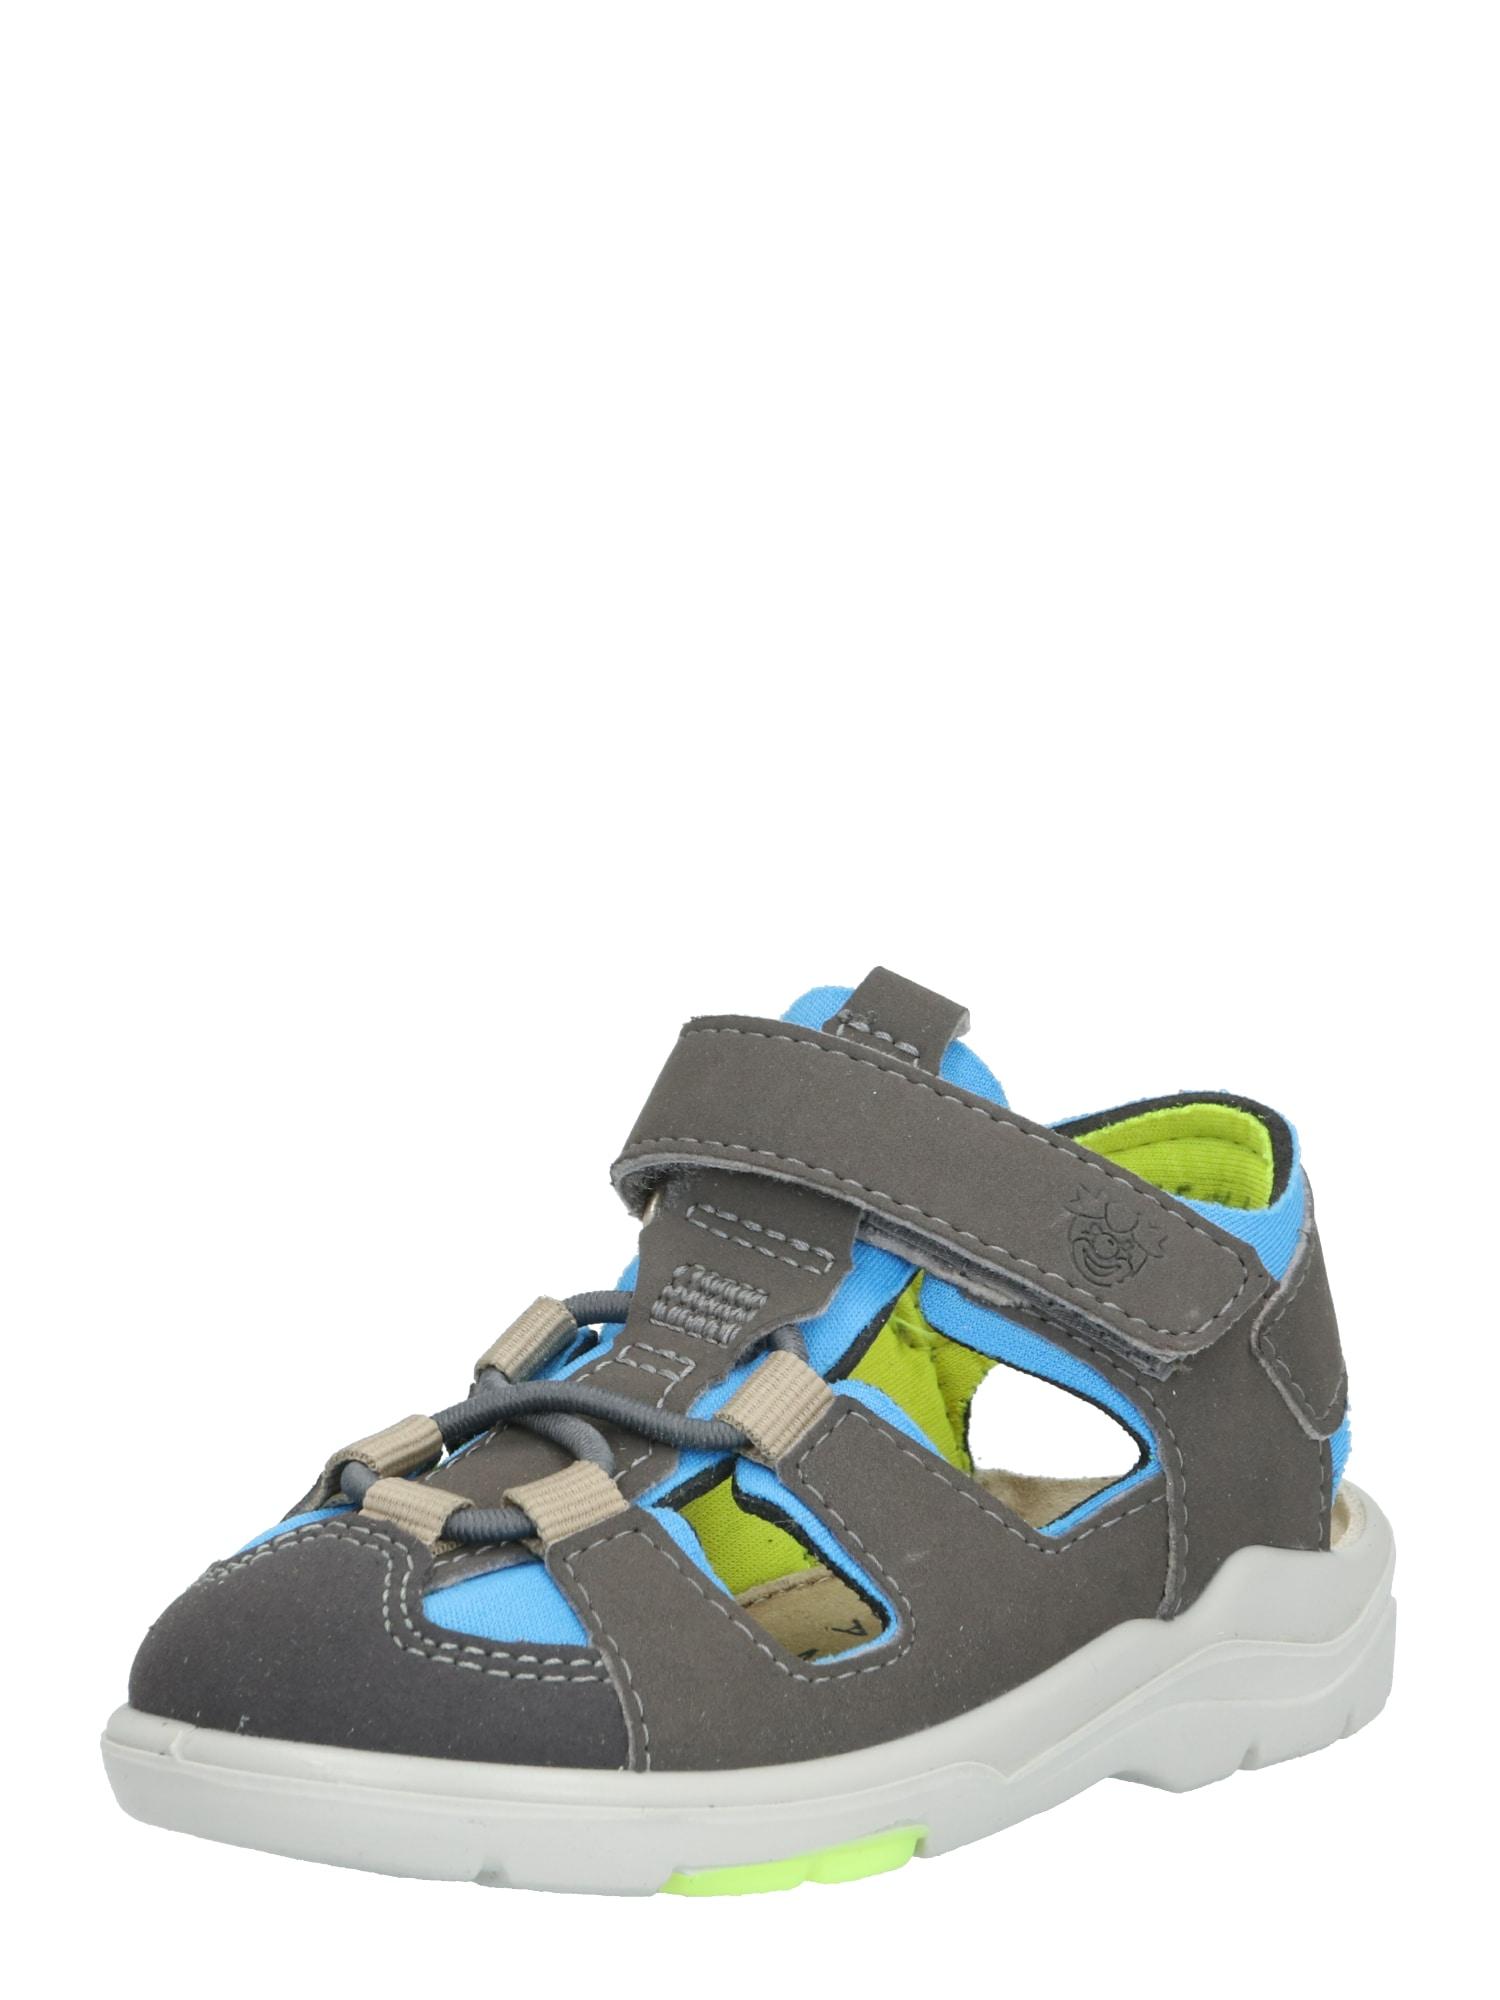 RICOSTA Atviri batai